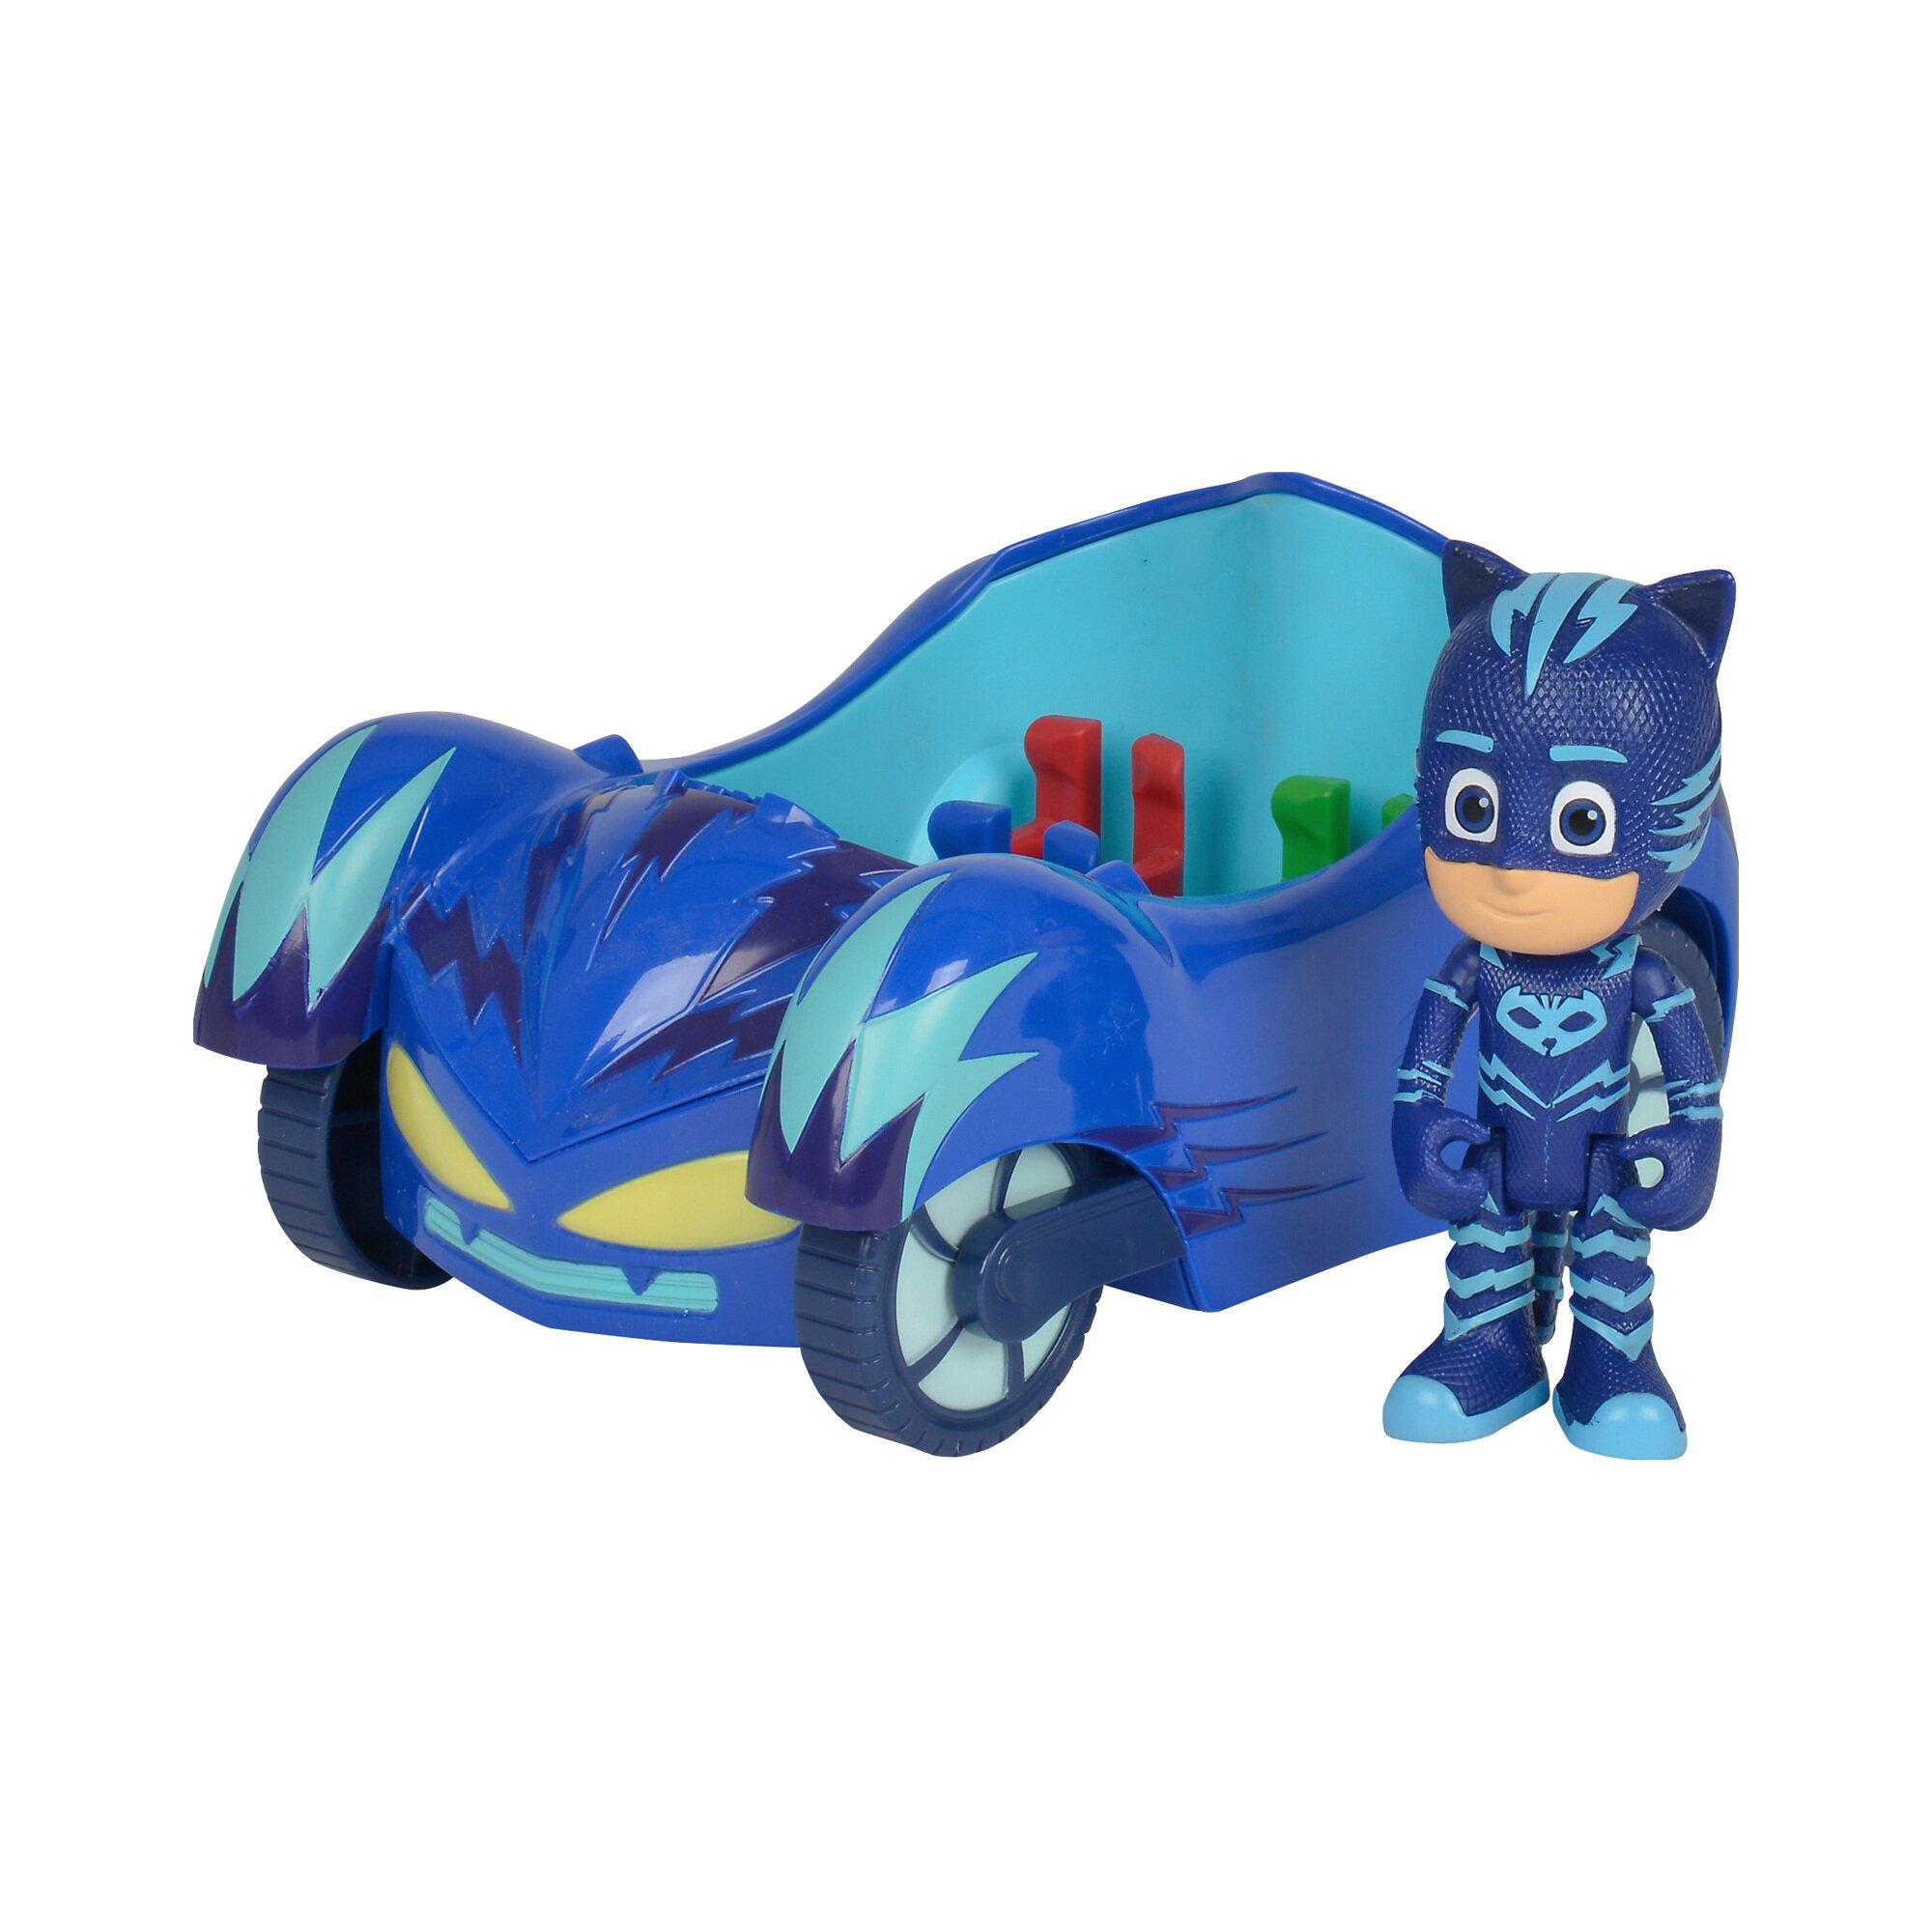 pj-masks-catboy-mit-fahrzeug